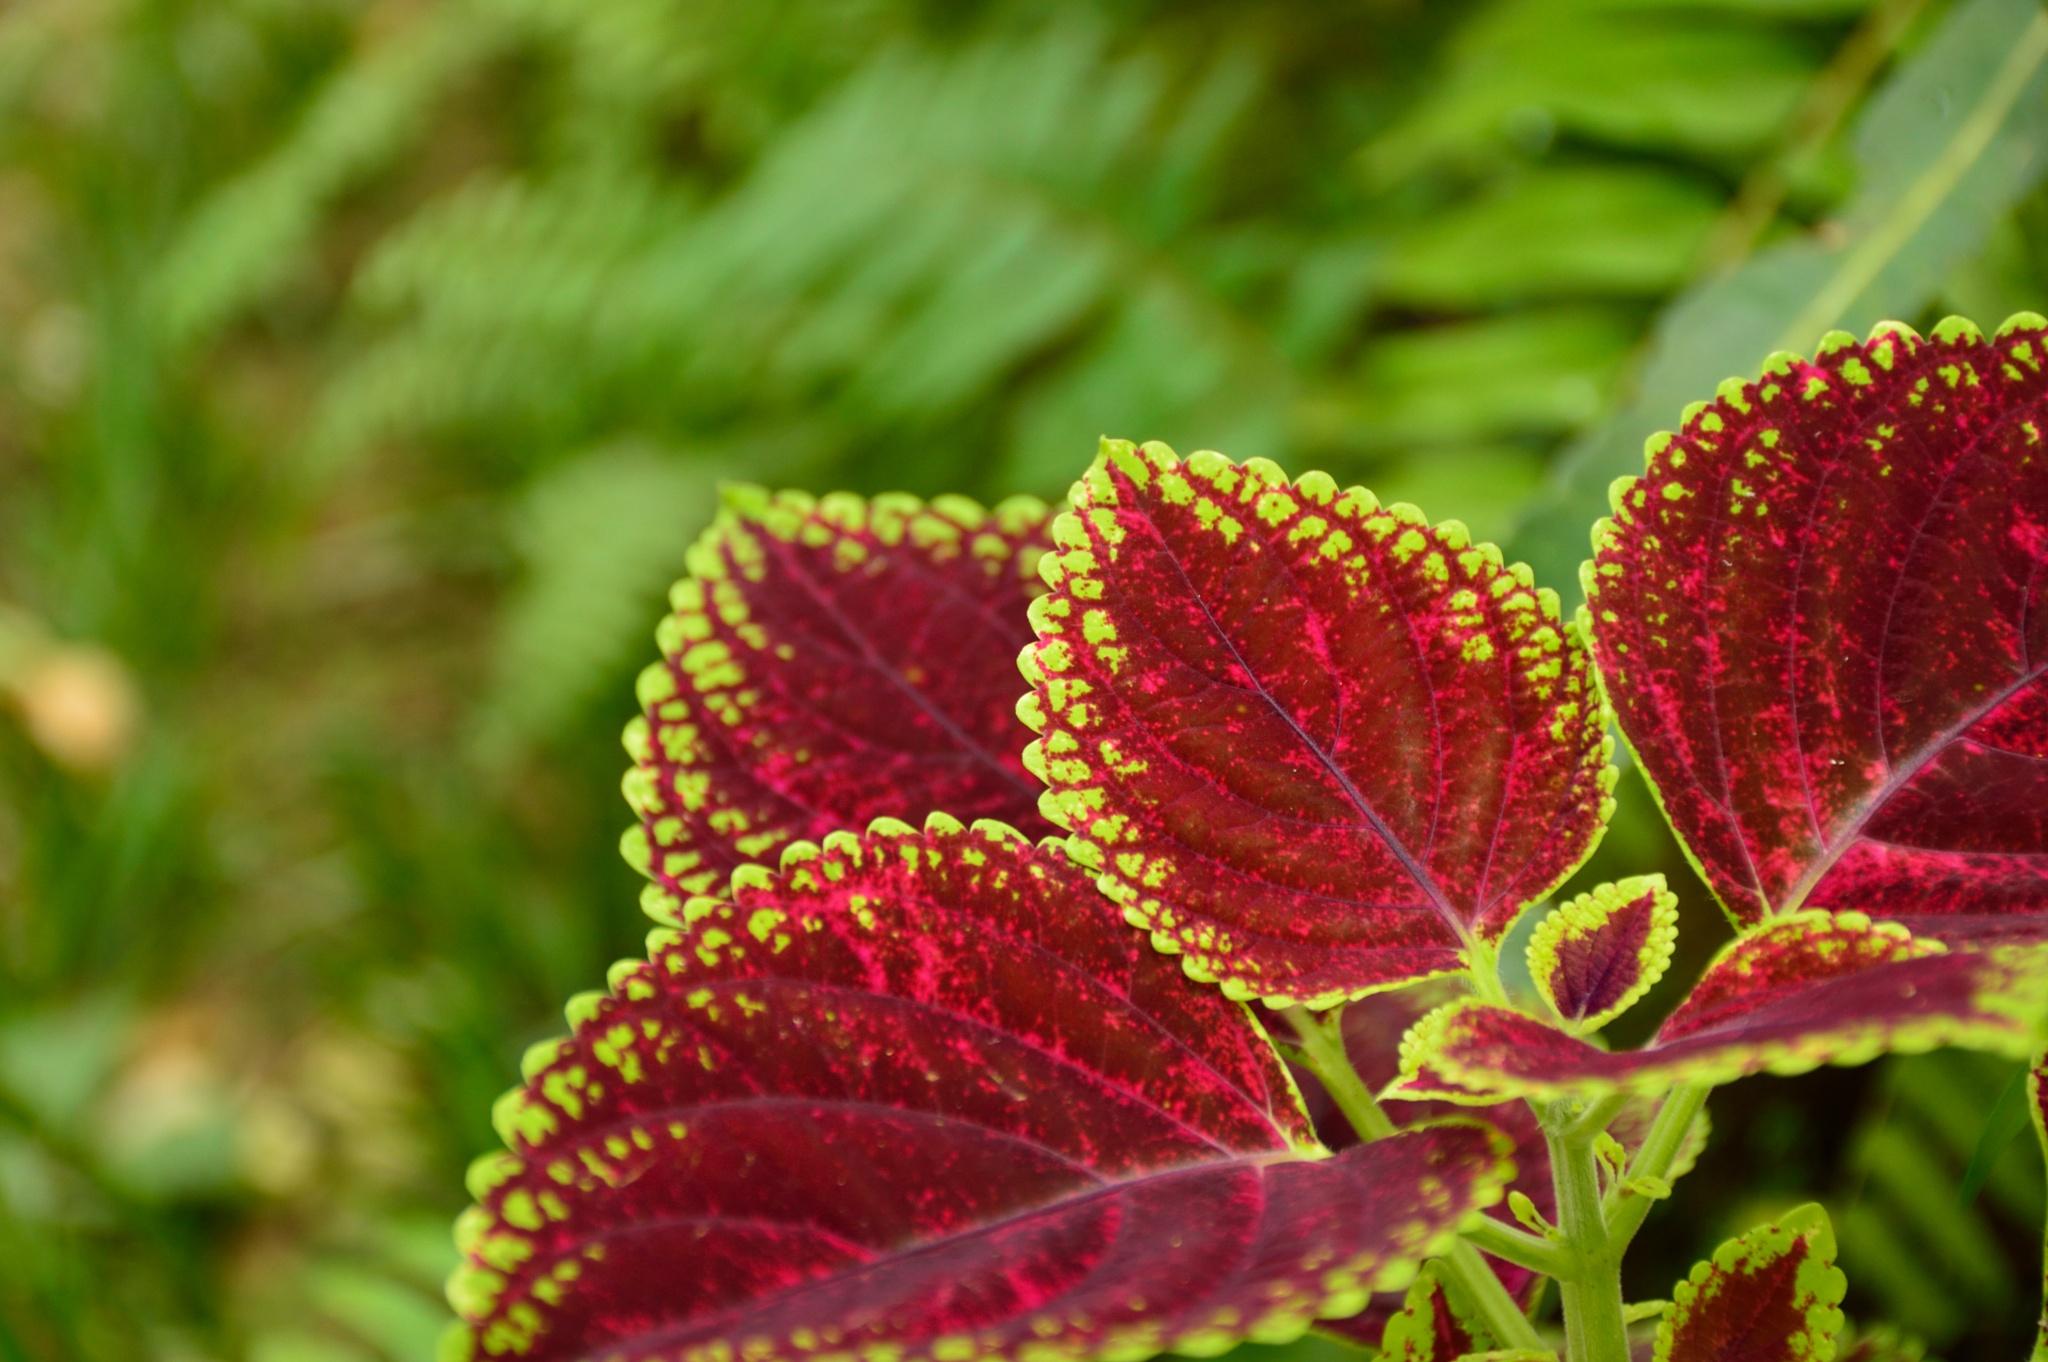 Moments from Phuket Botanic Garden #1 by Laszlo Ecsedi